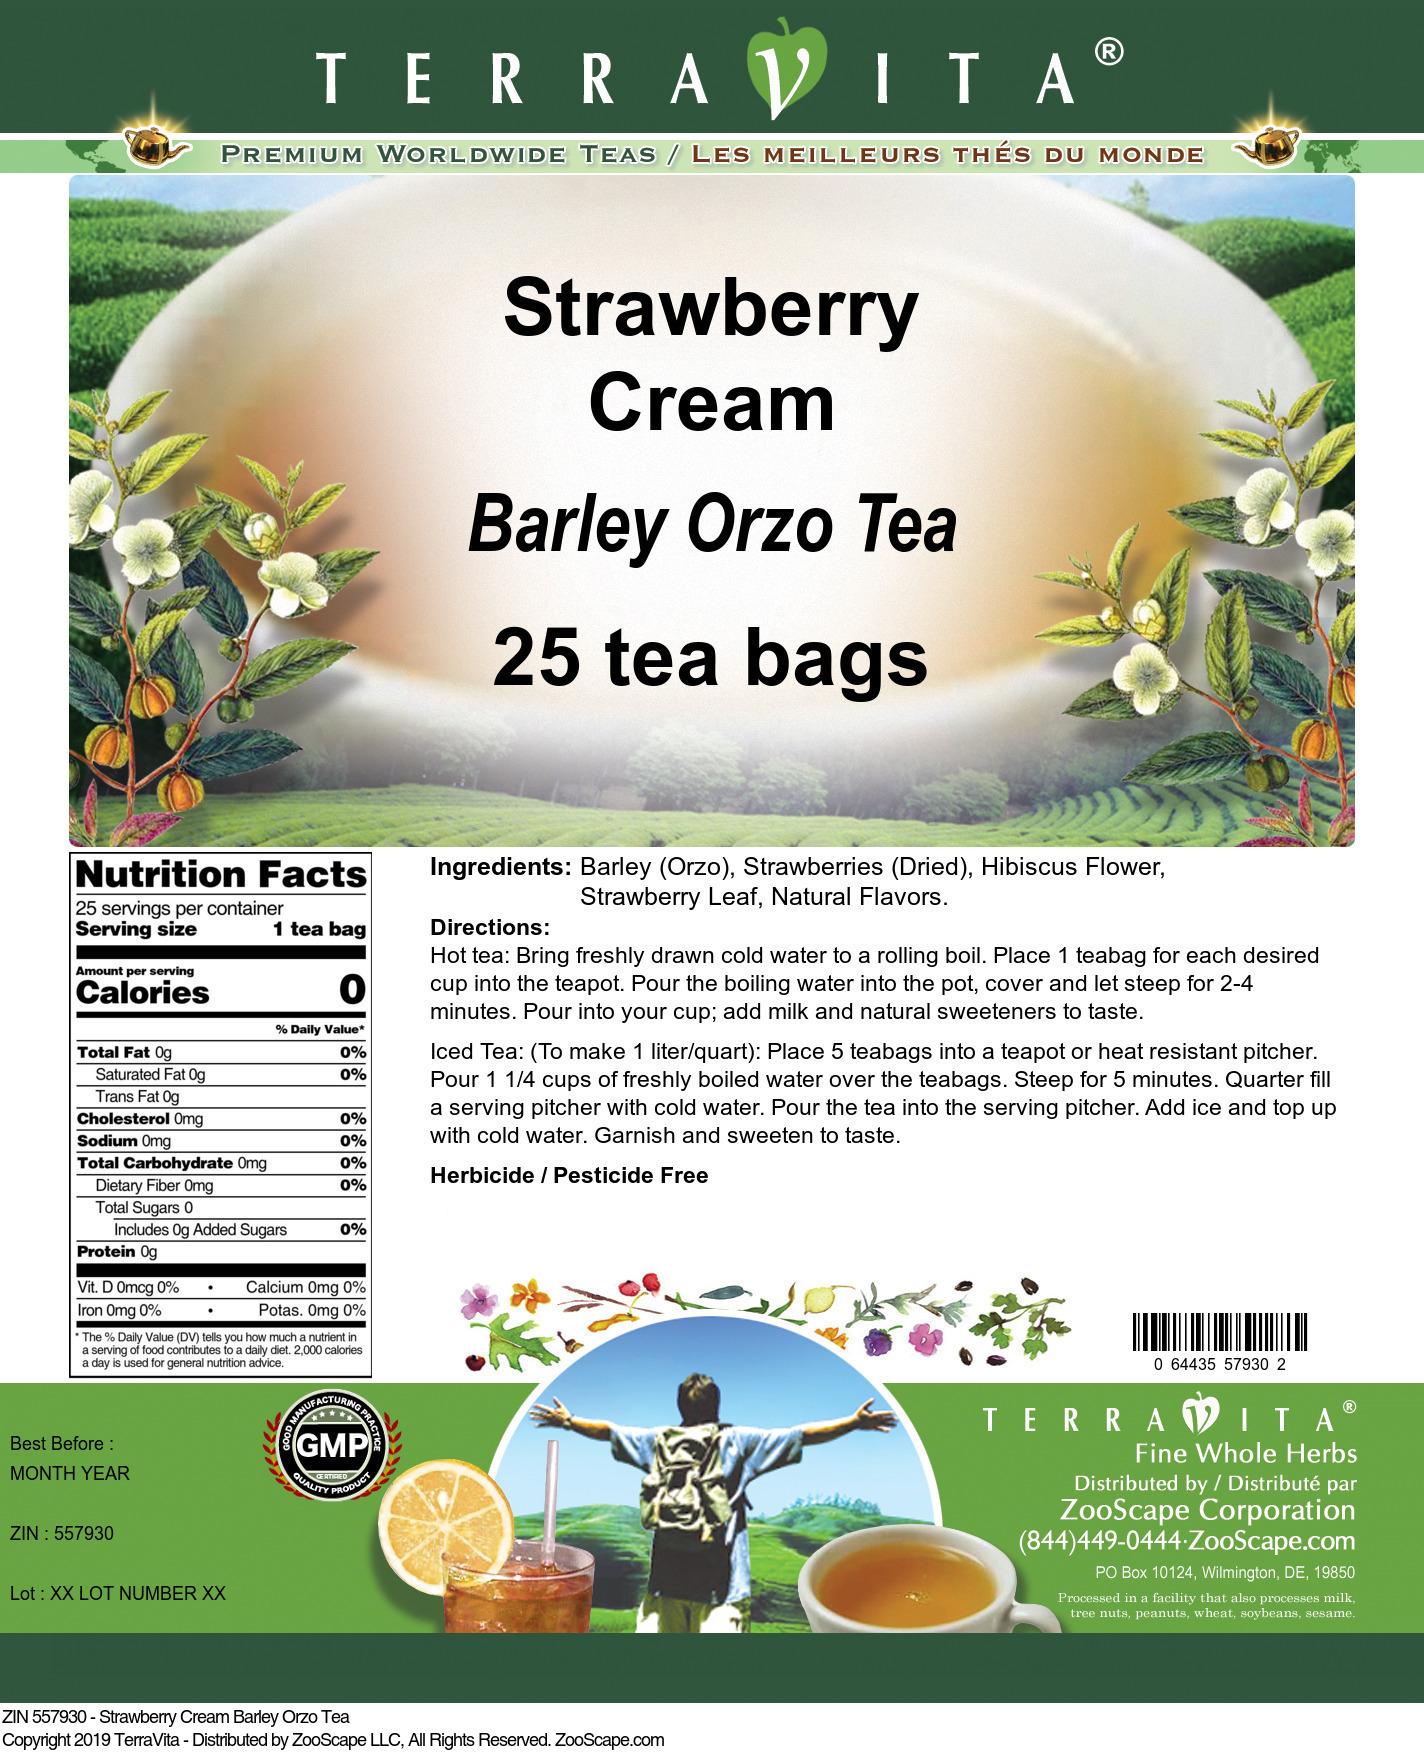 Strawberry Cream Barley Orzo